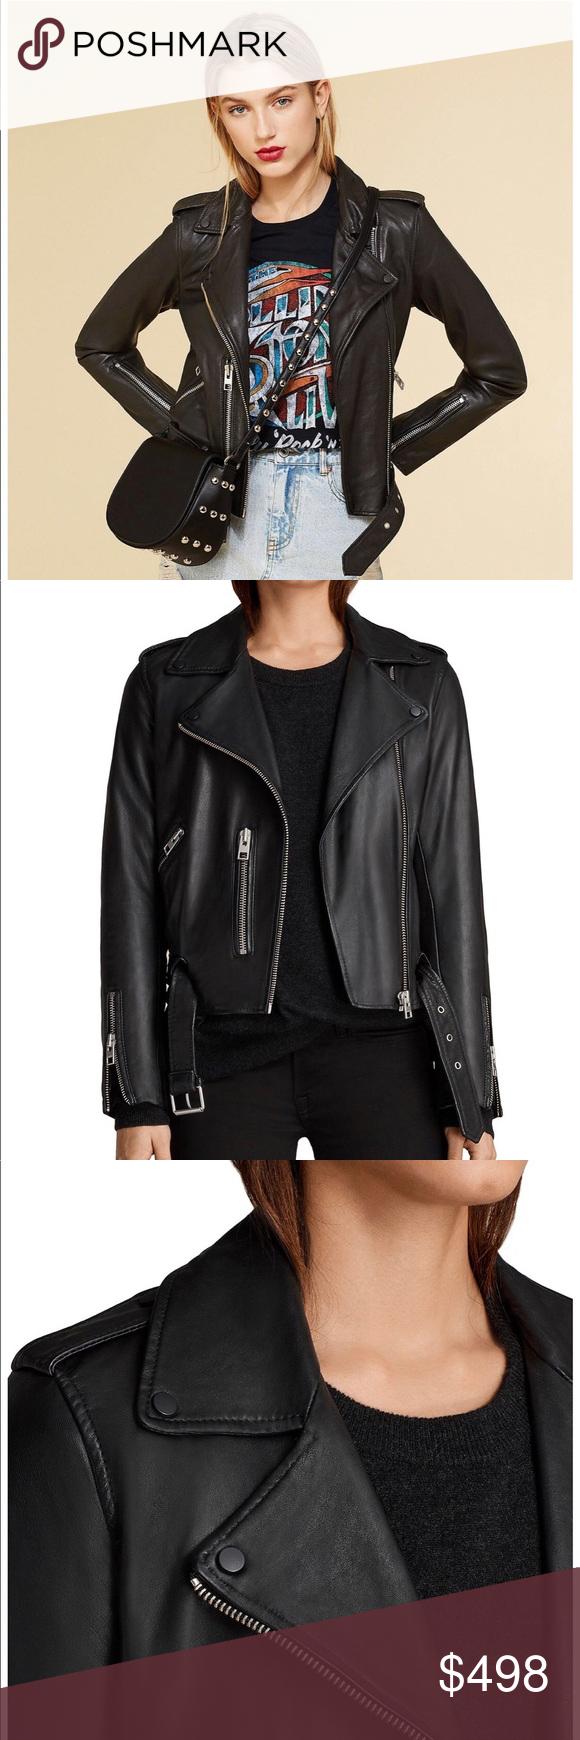 41ddbfdaf NWT All Saints Balfern Leather Biker Jacket Brand New With Tags! All ...